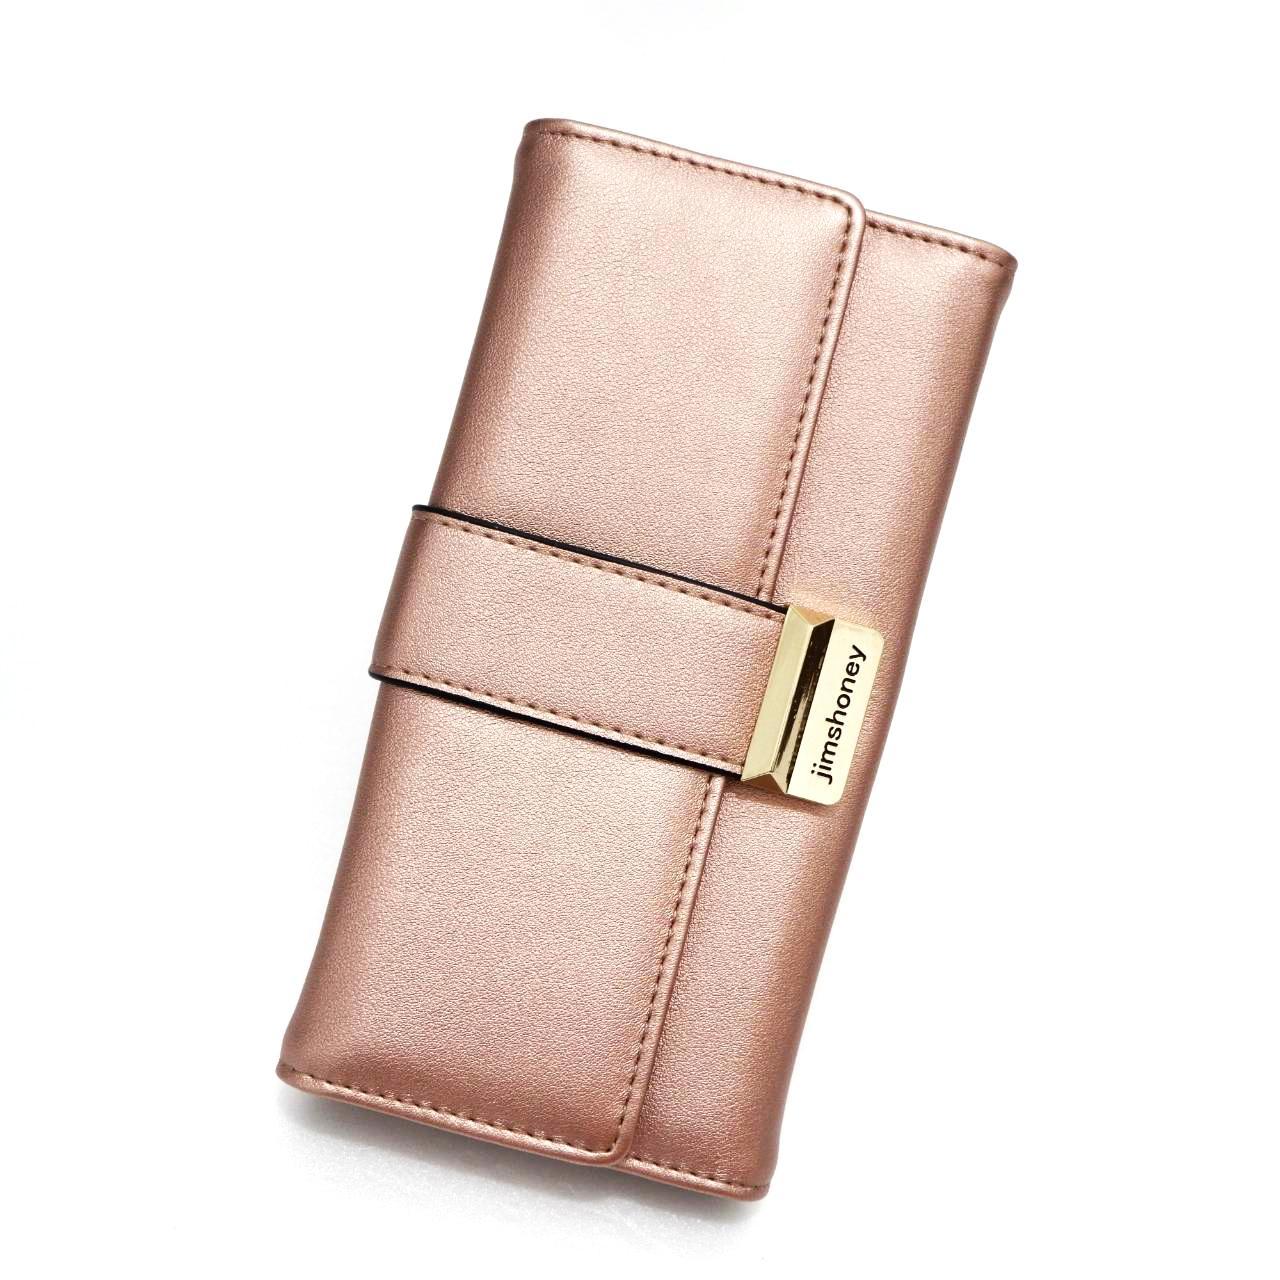 Jims Honey - Dompet Fashion Import - Amour Wallet (Rosegold)